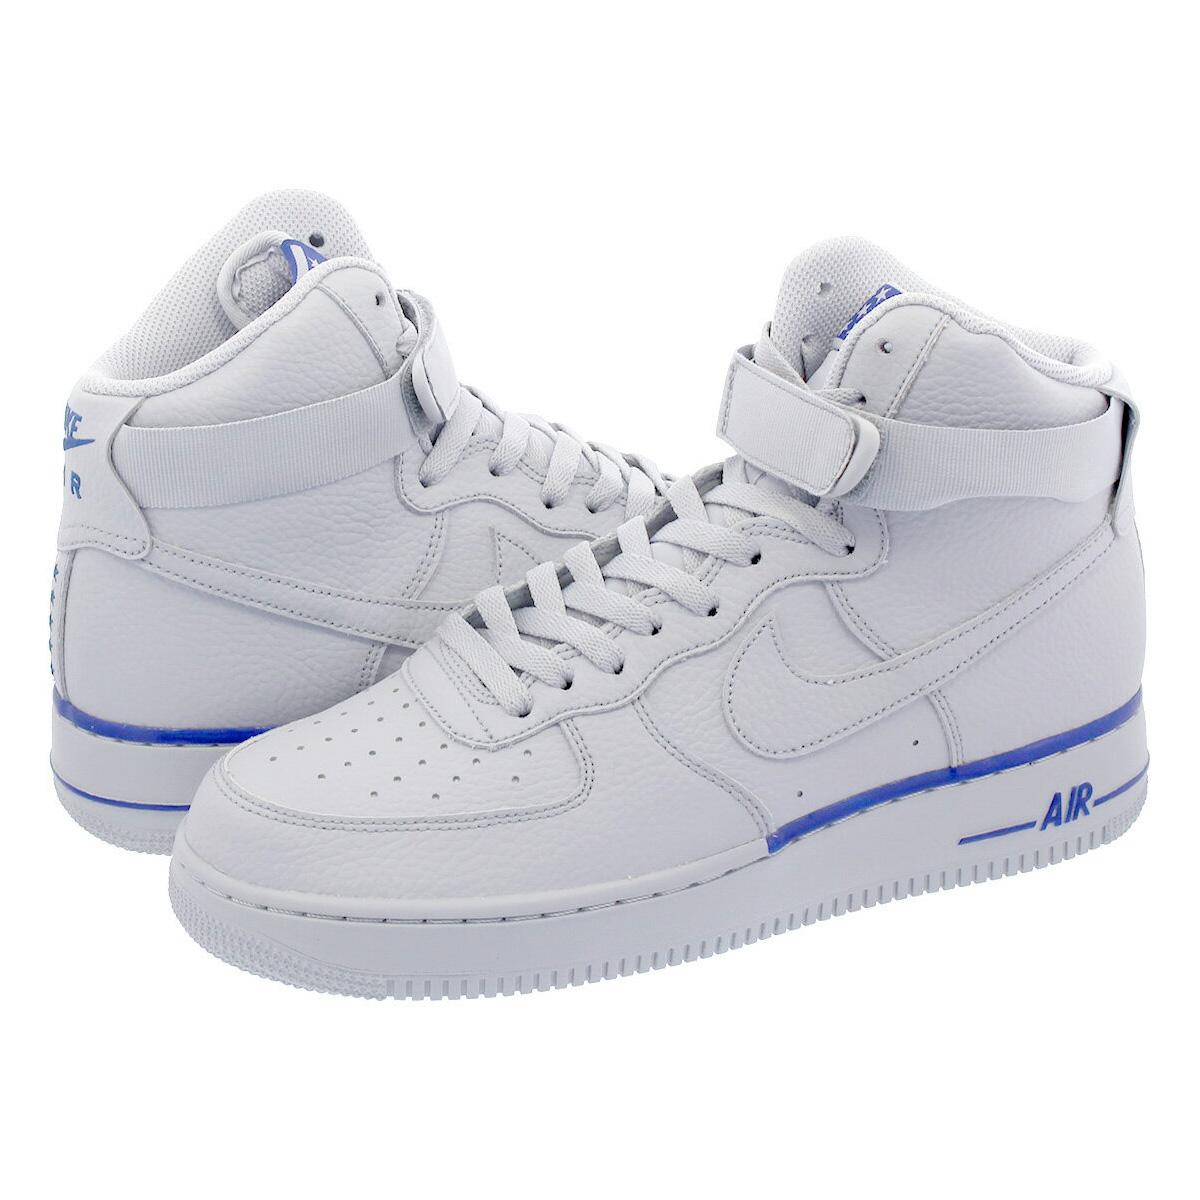 online store 8da9b b4dfe SELECT SHOP LOWTEX: NIKE AIR FORCE 1 HIGH 07 Nike air force 1 high ...